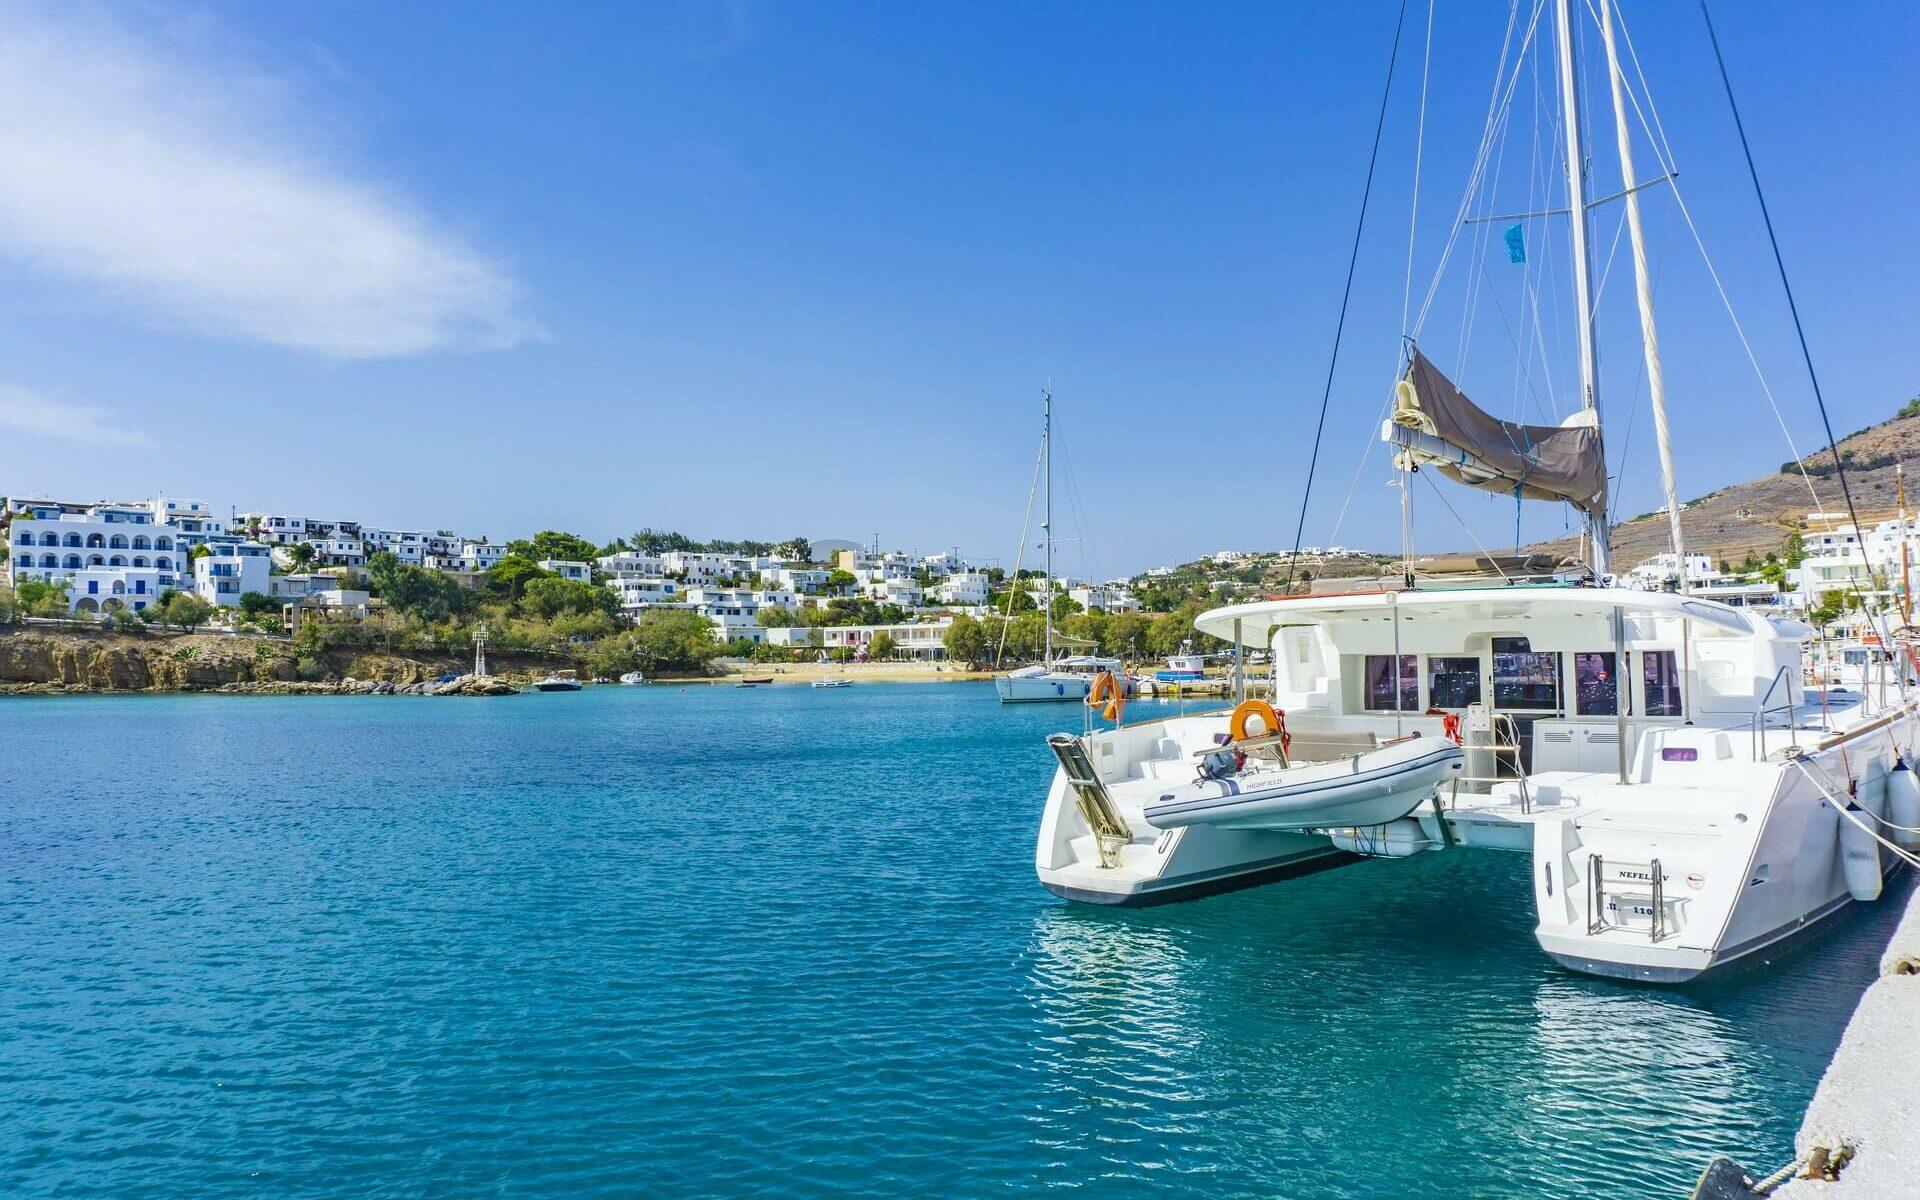 a white catamaran docked near shore in blue water